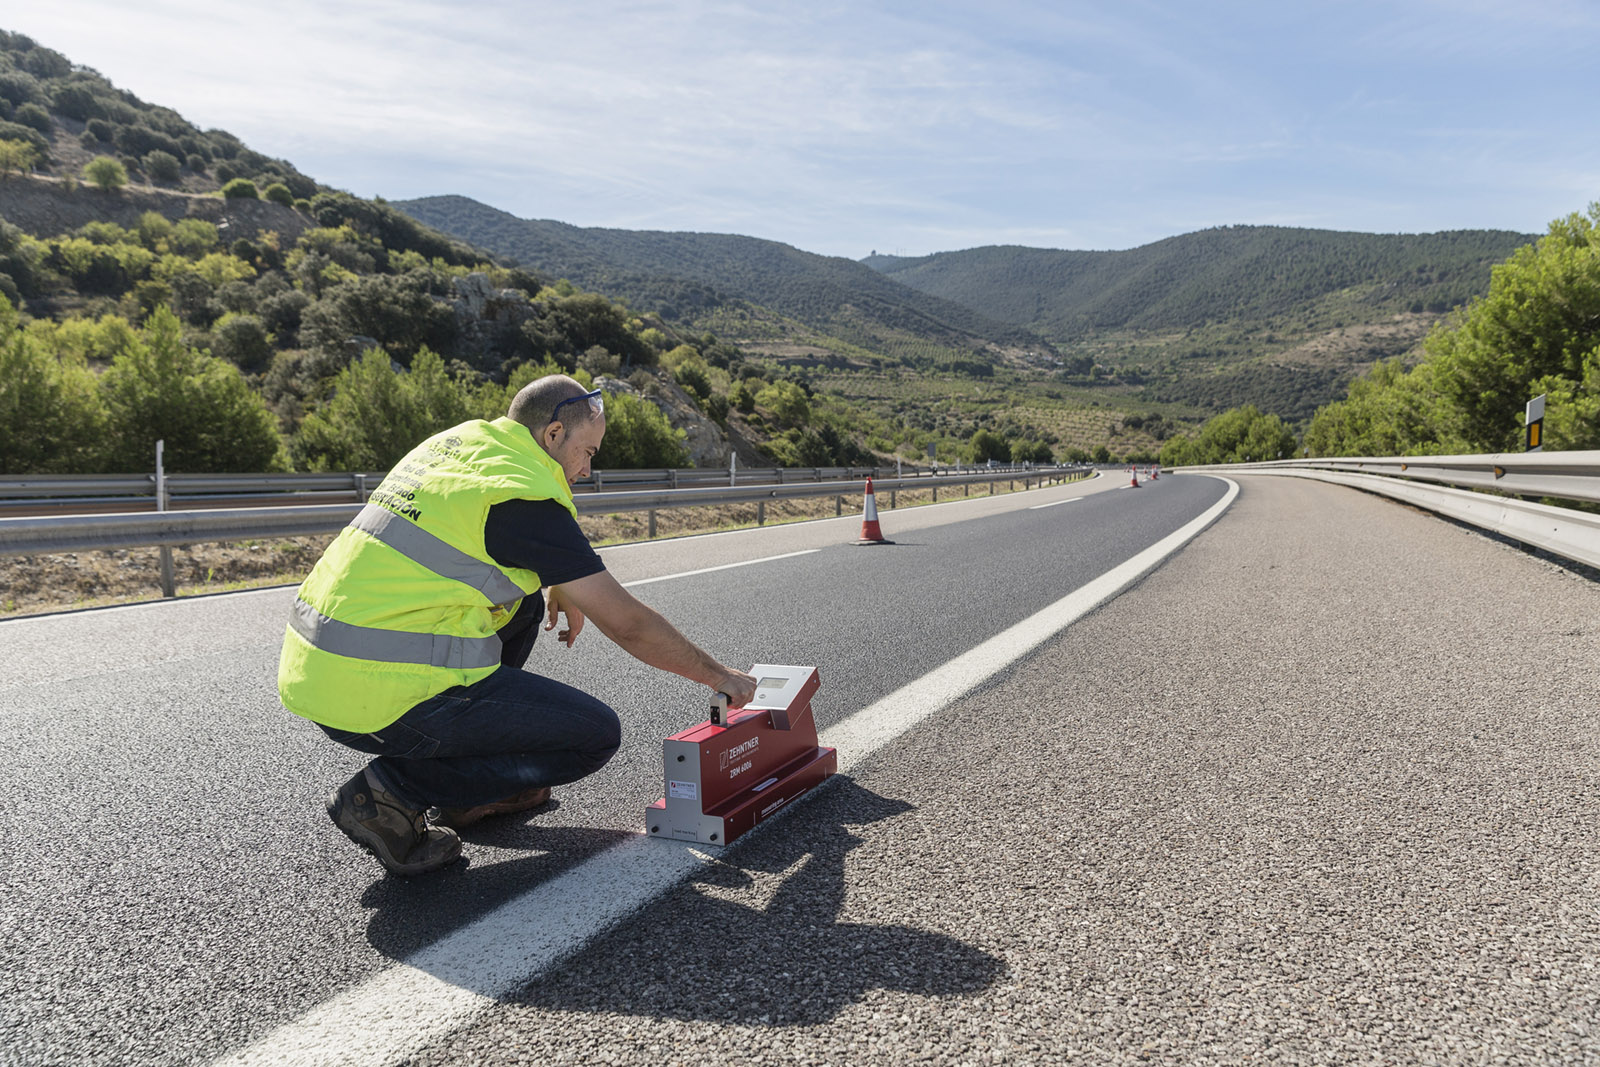 corporate-industrial-photographer-Madrid-Spain-861.jpg